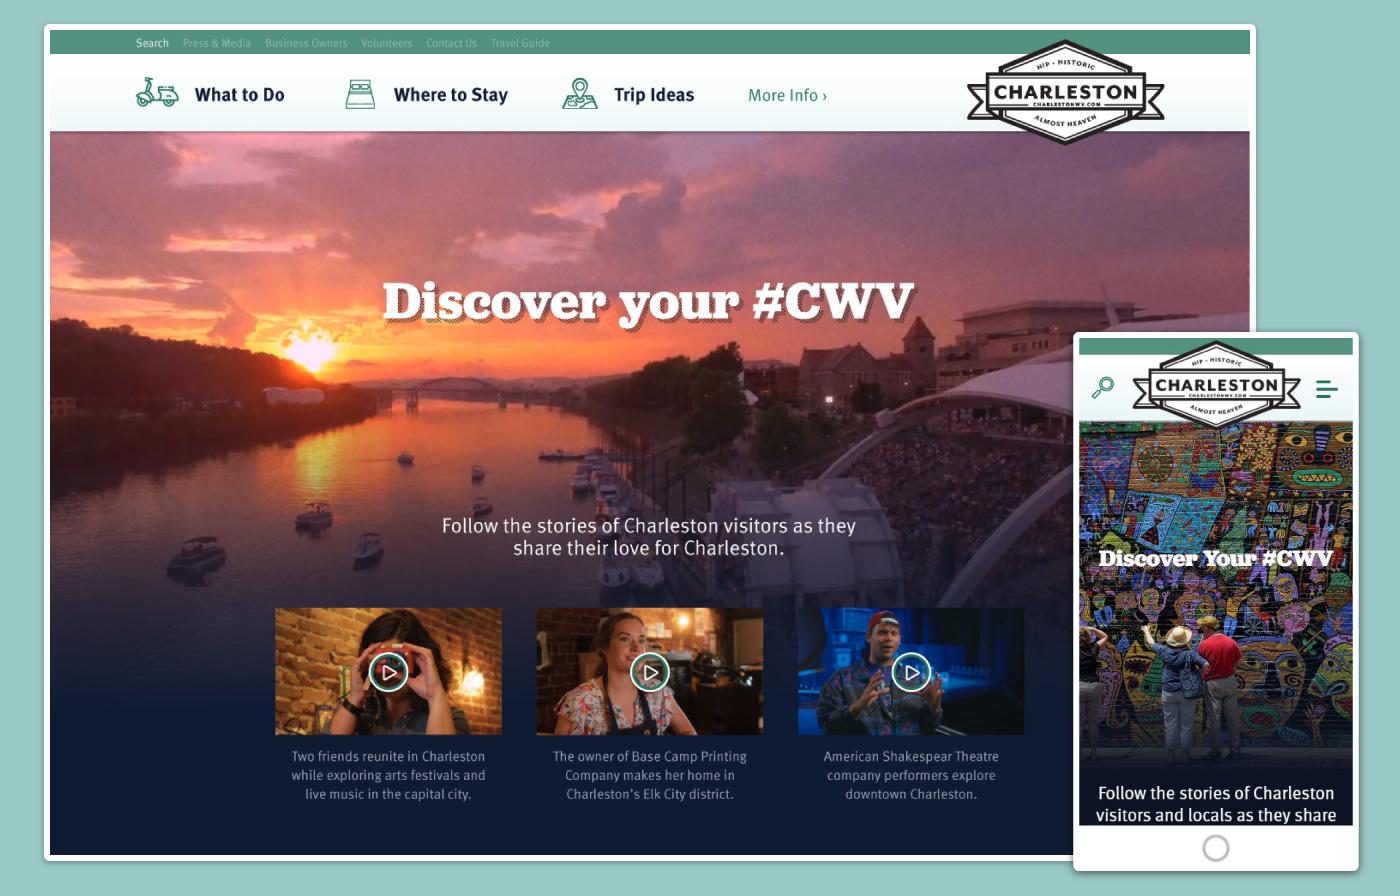 charlestonwv.com homepage on desktop and mobile.